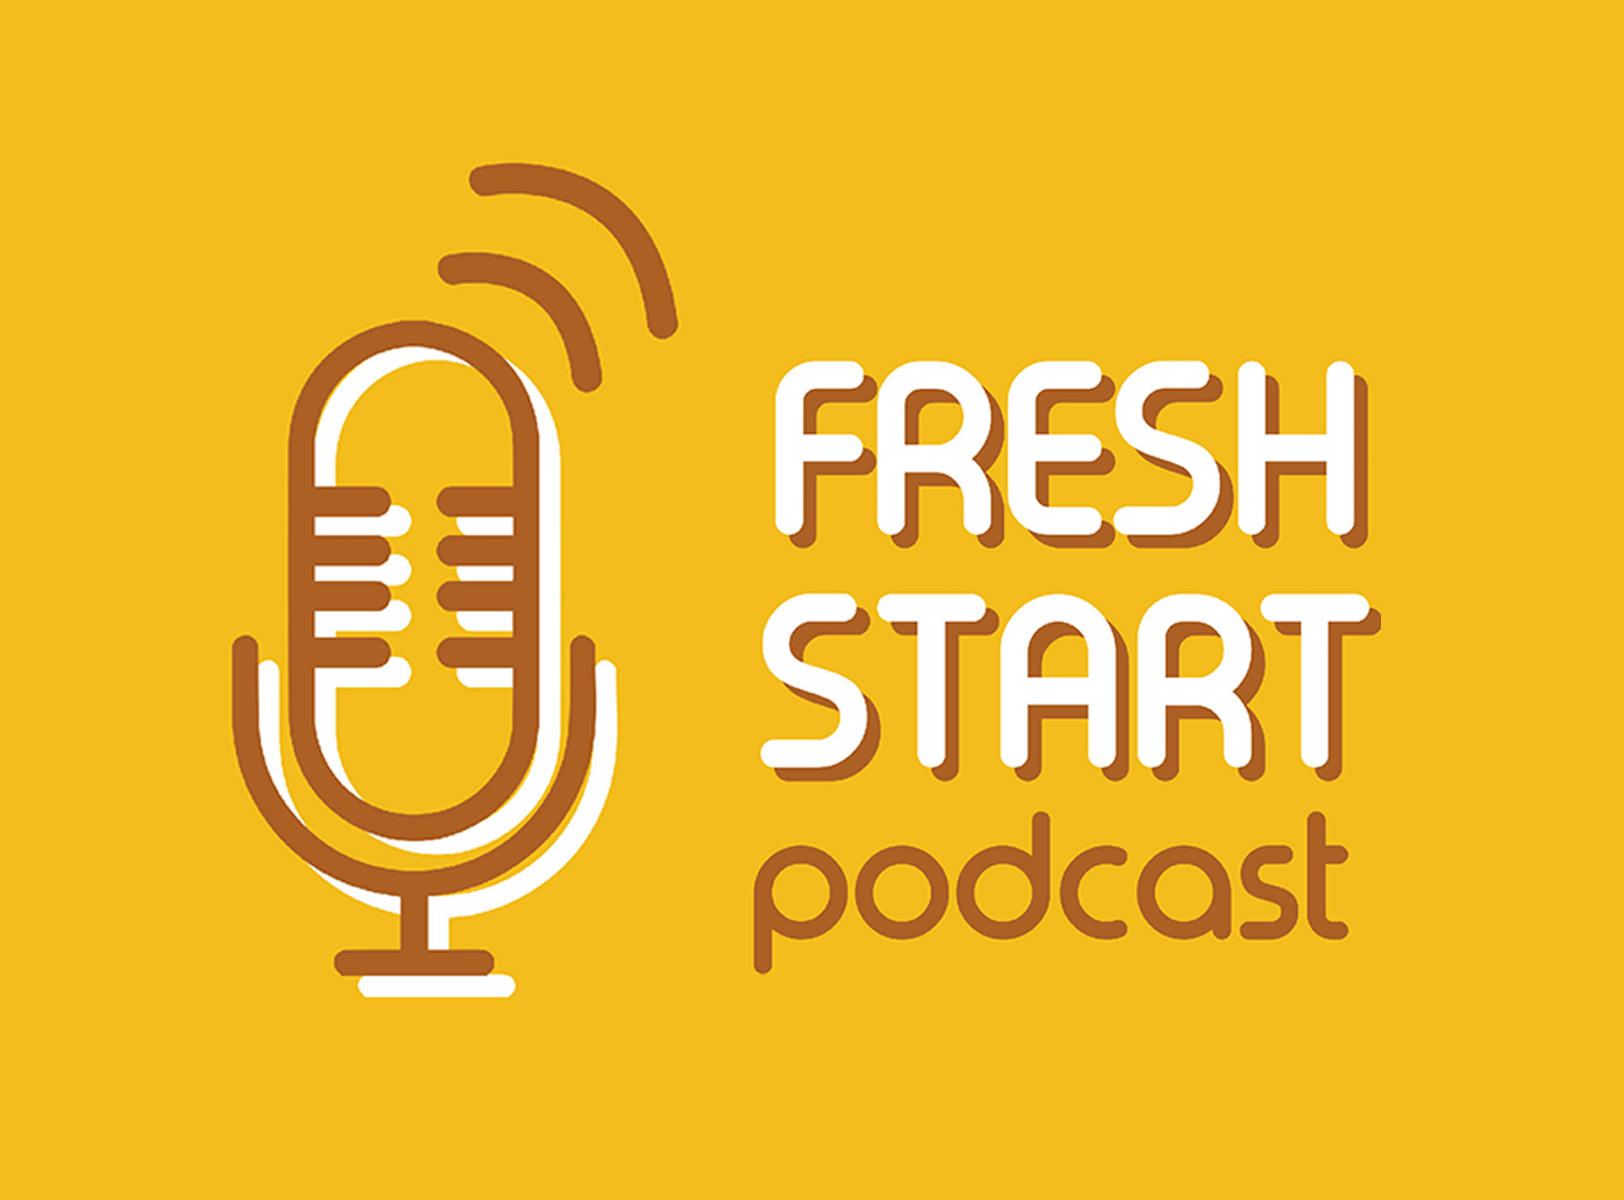 Fresh Start: Podcast News (5/24/2020 Sun.)